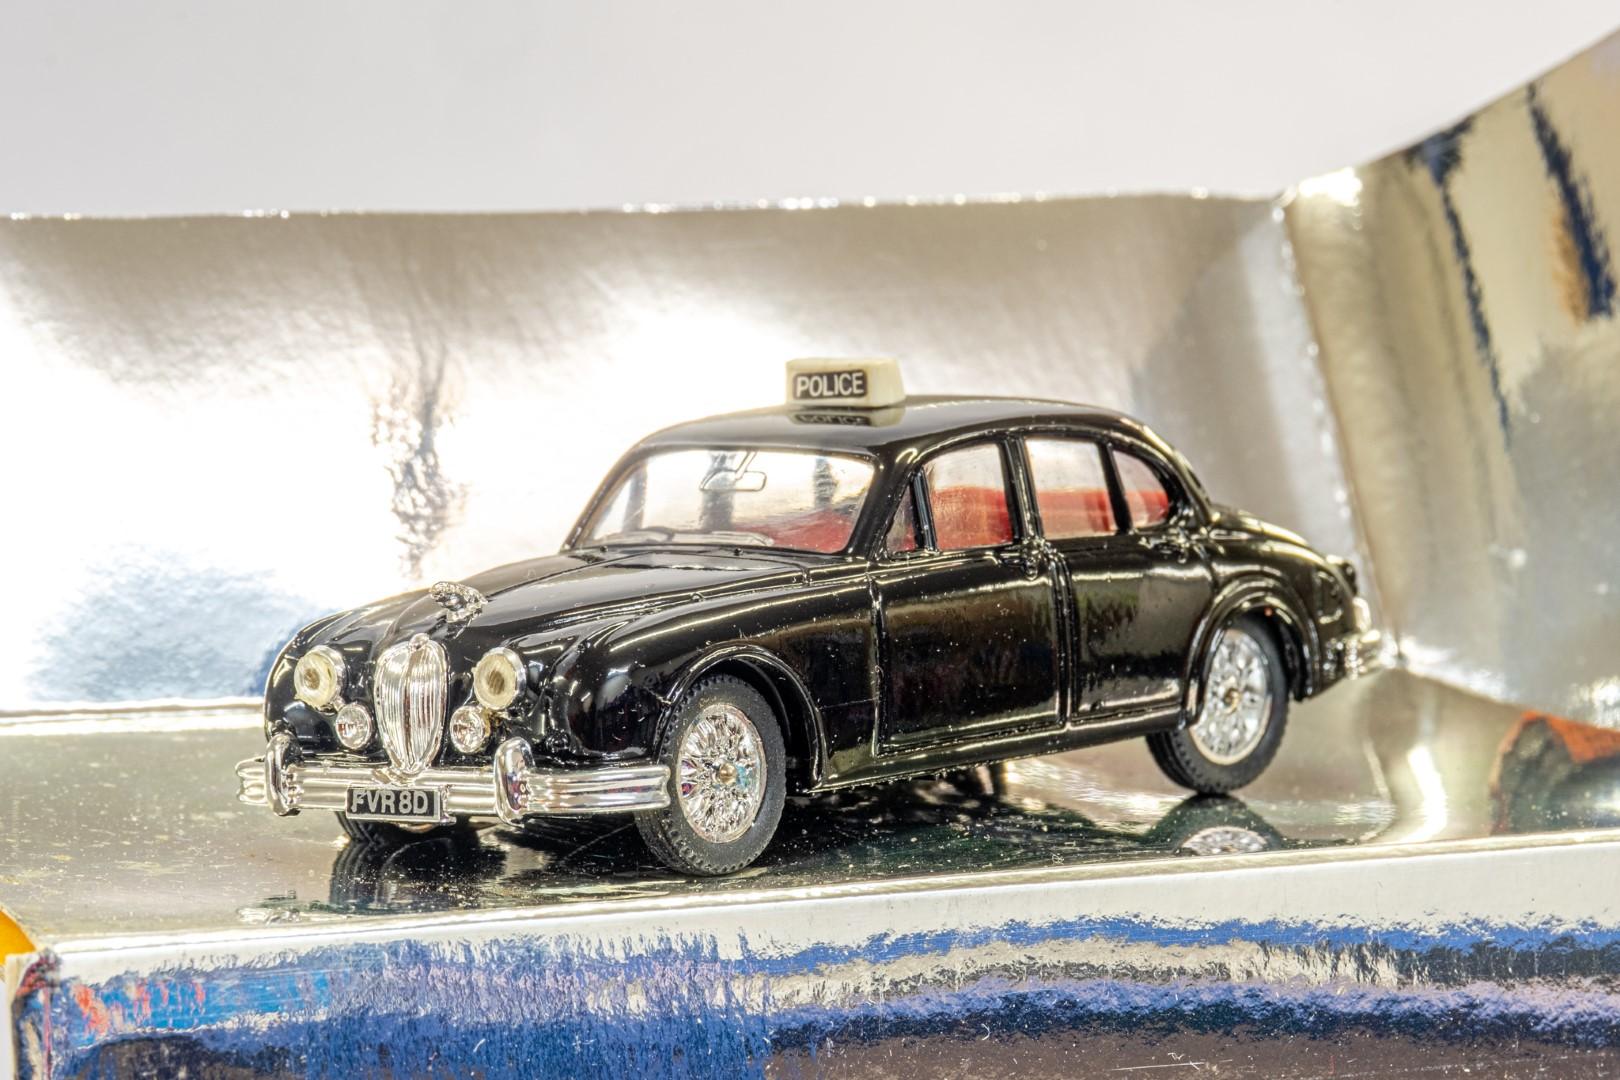 Corgi 1959 Jaguar MKII - Police - Image 4 of 4